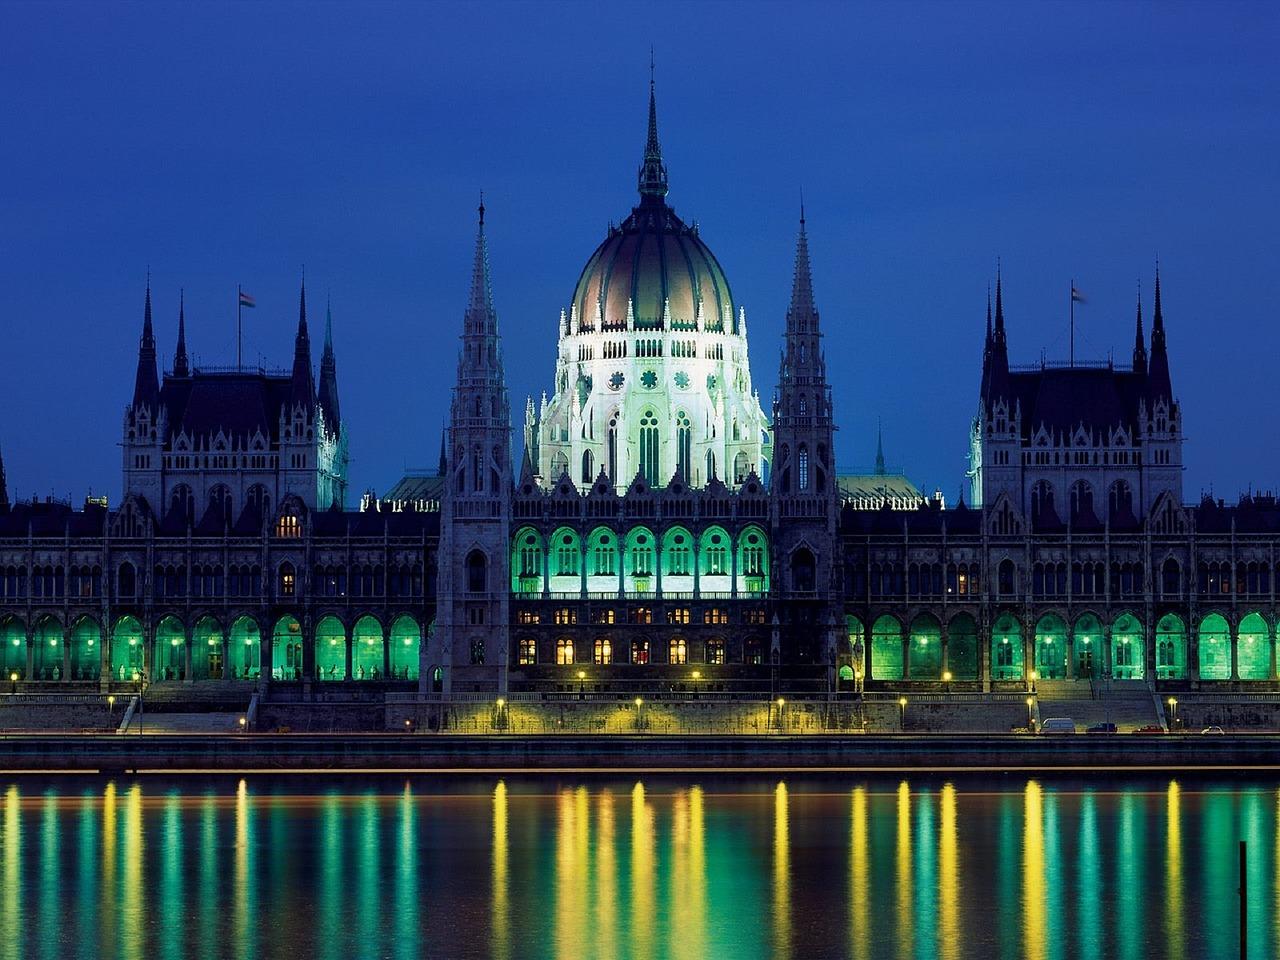 Flights to Europe, travel deals at Brads Deals, Parliament,